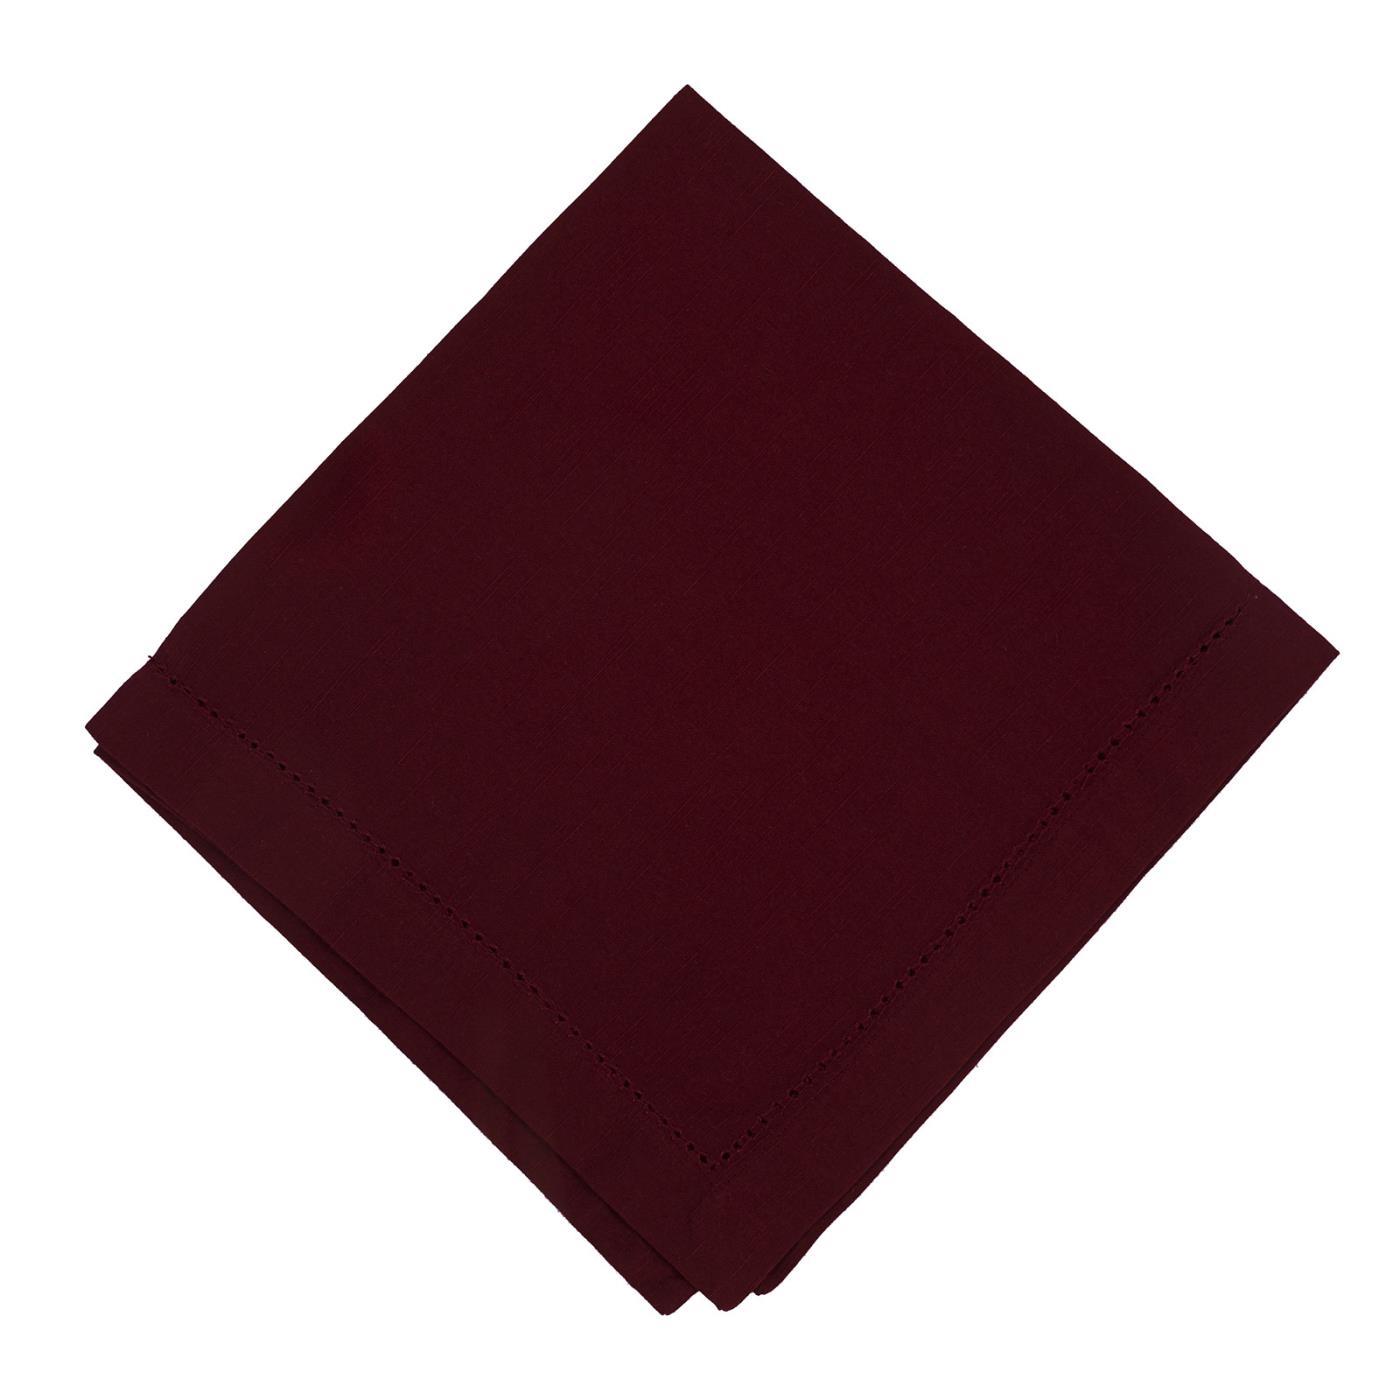 Burgundy - Linen - Hemstitched